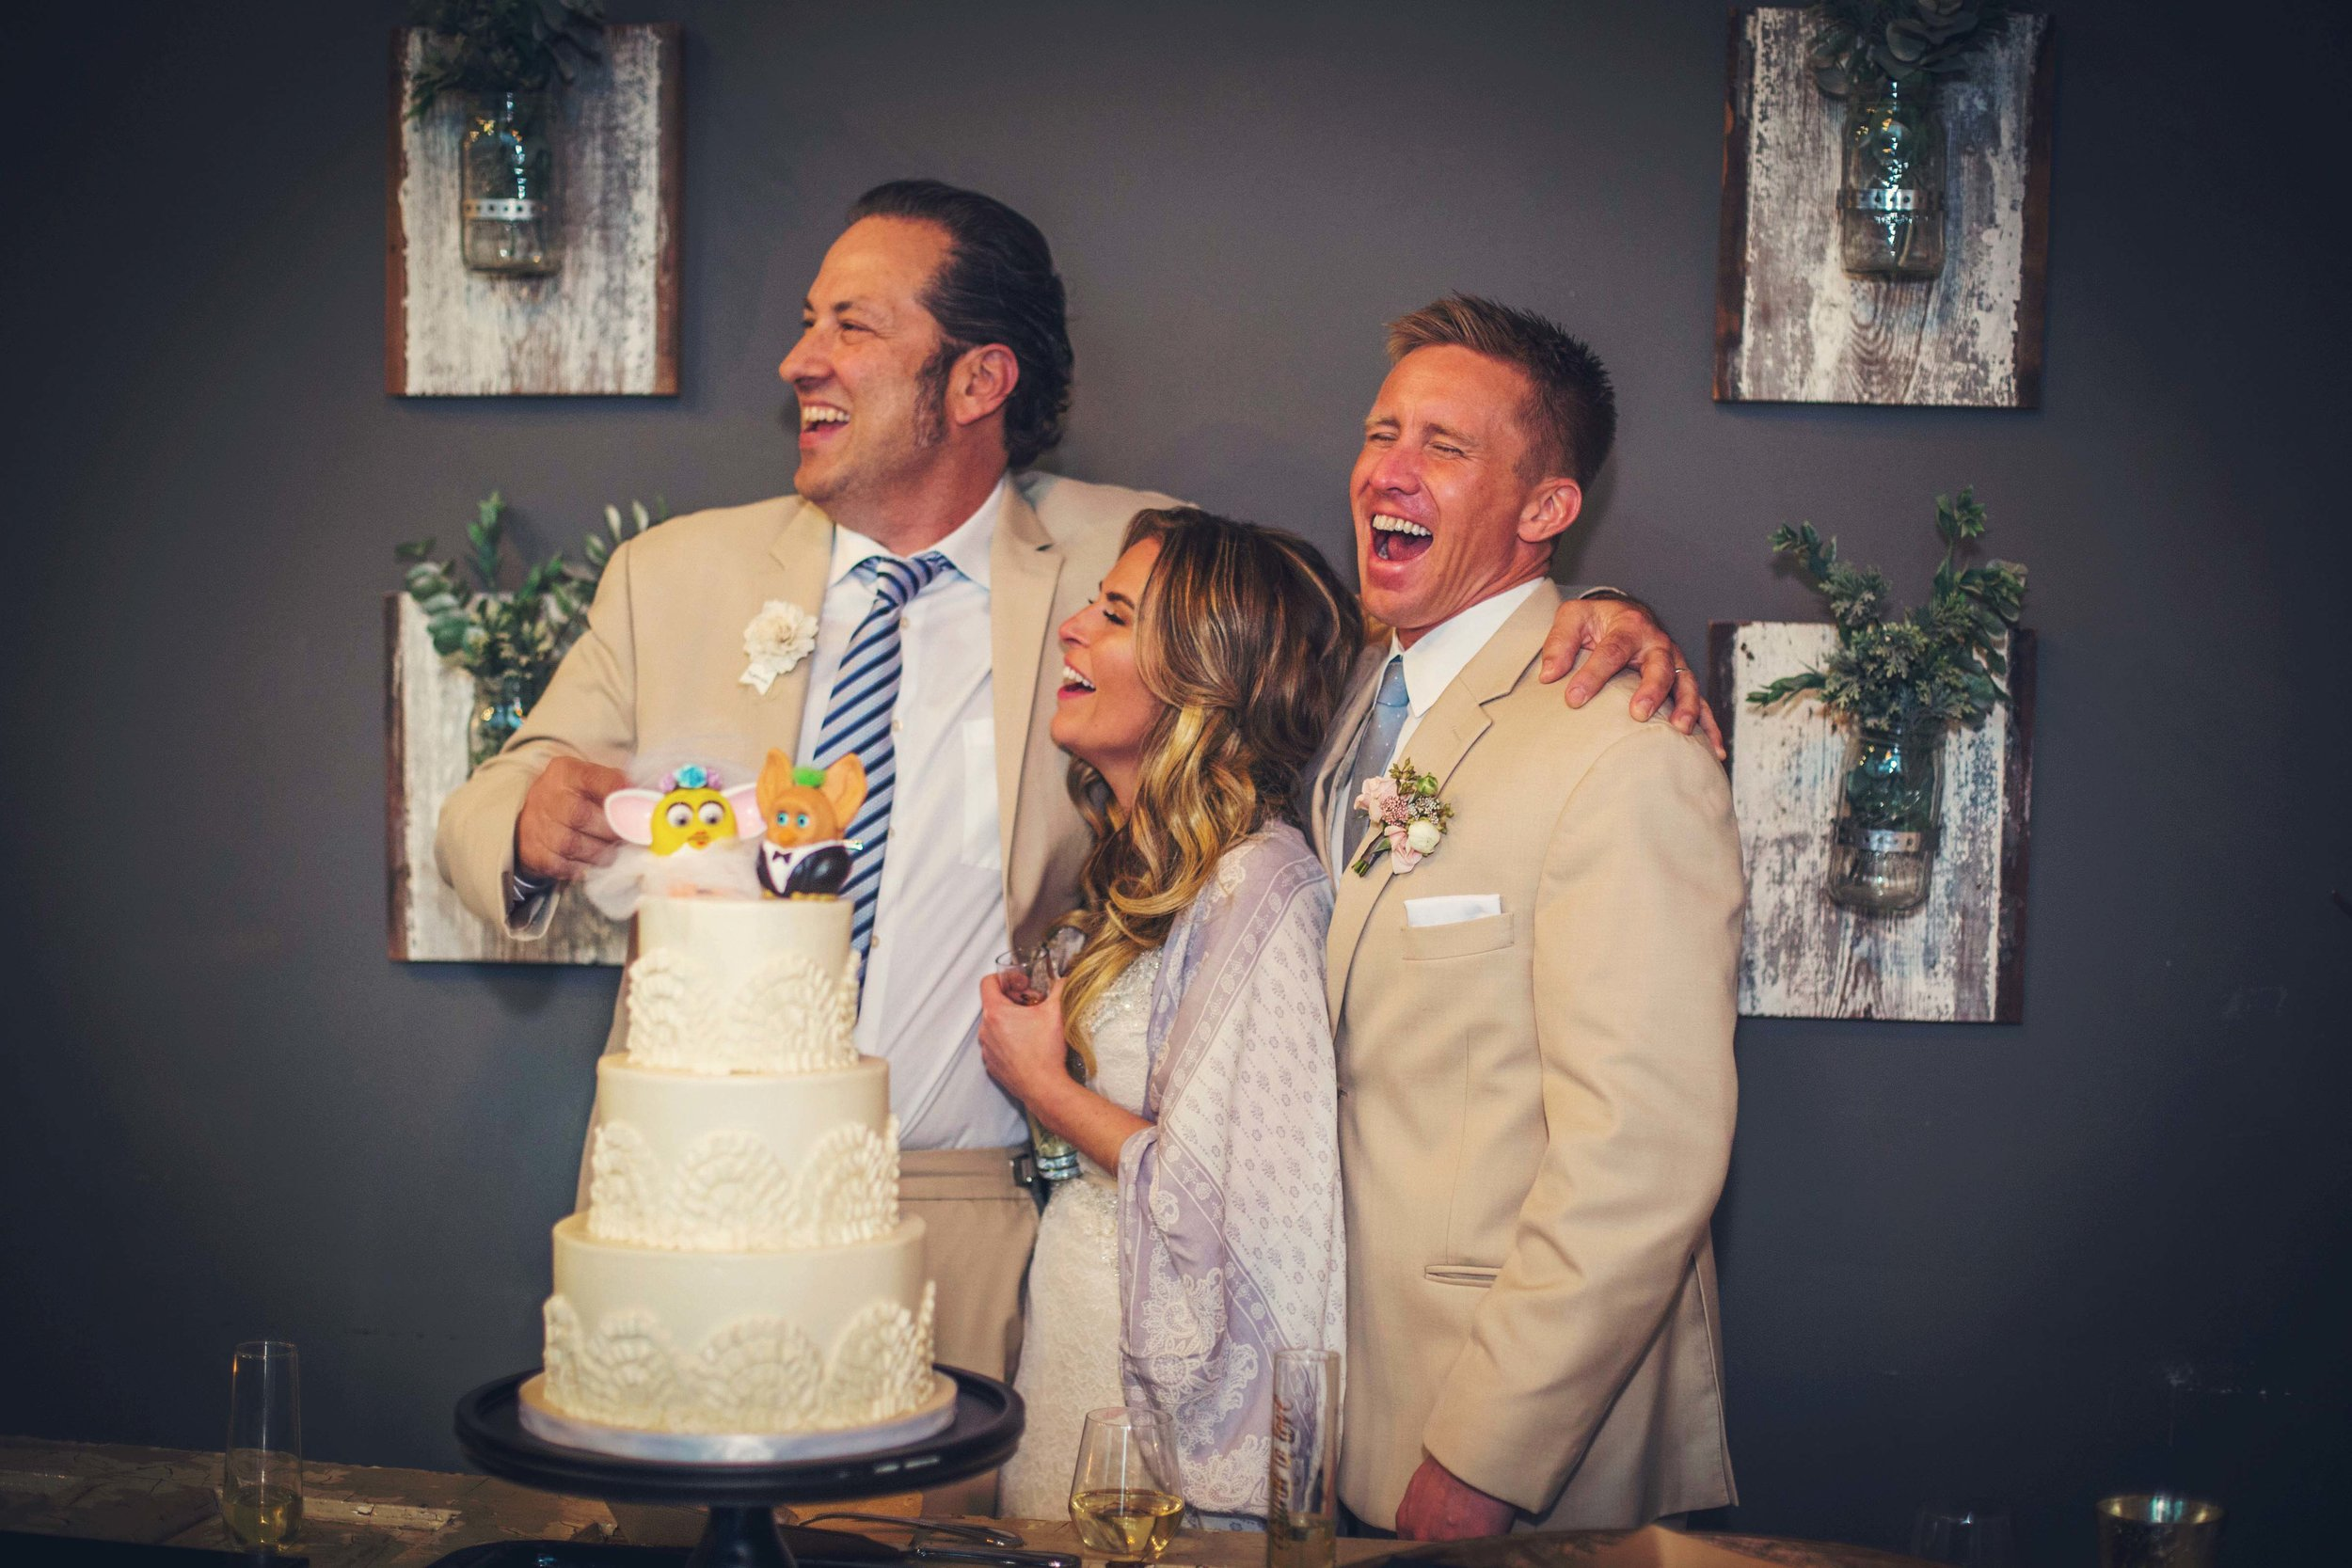 Kansas City-Small Wedding-Elope-Reception-Intimate-Ceremony-Megan & Jeff-214b.jpg